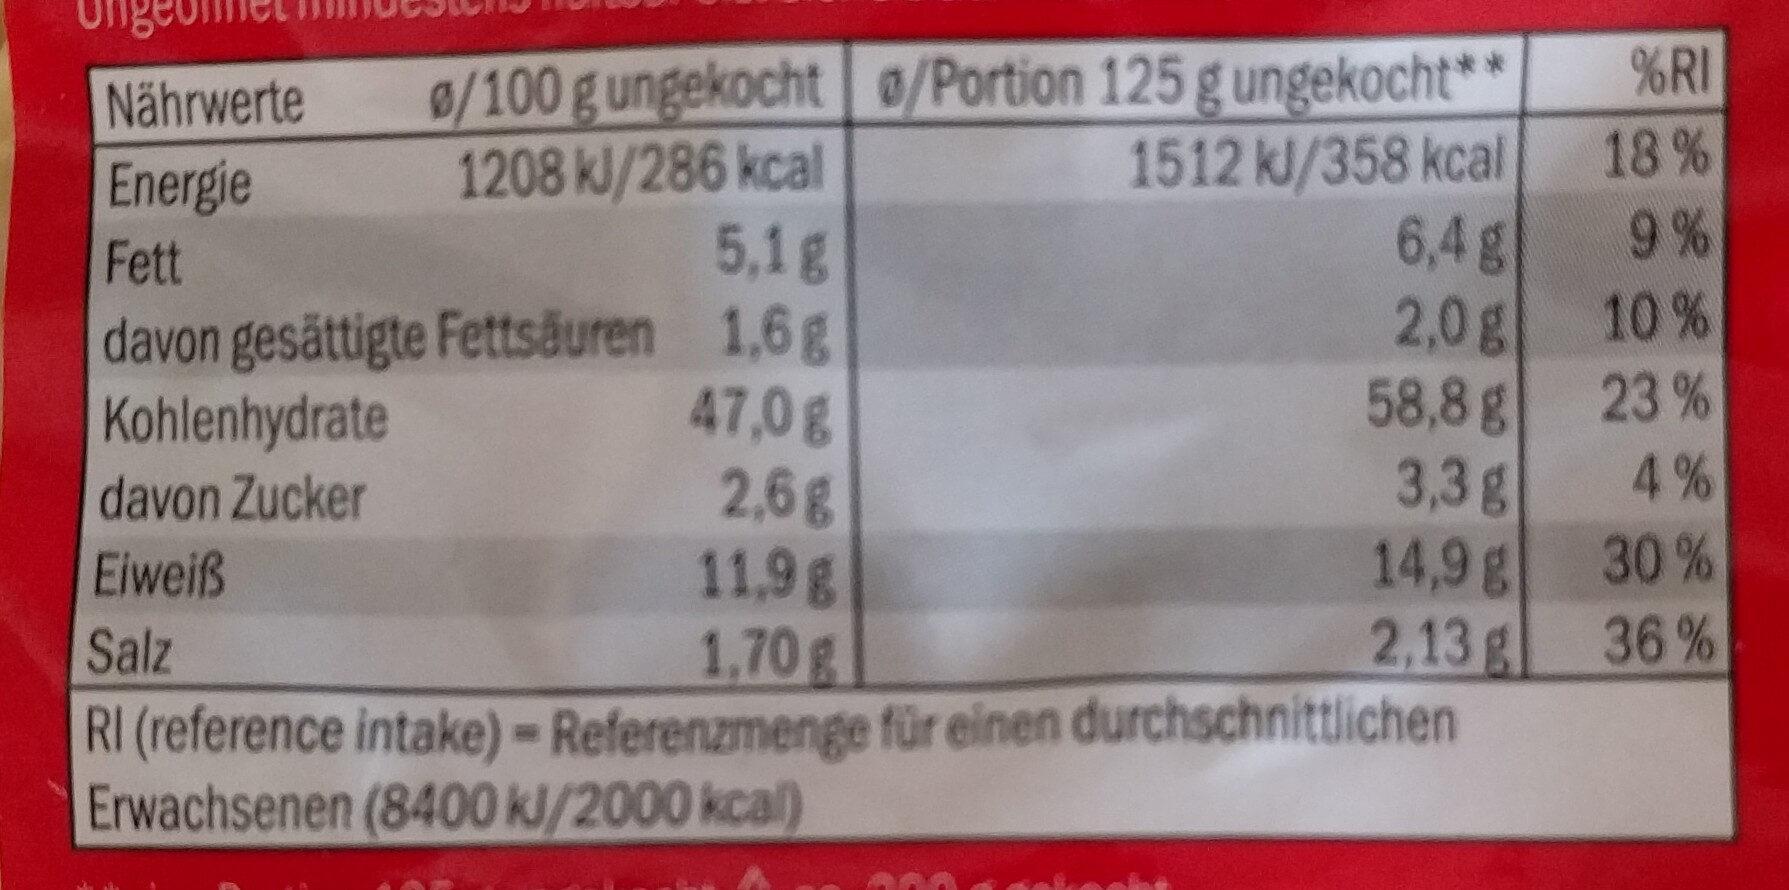 Tortelloni prosciutto - Nährwertangaben - de